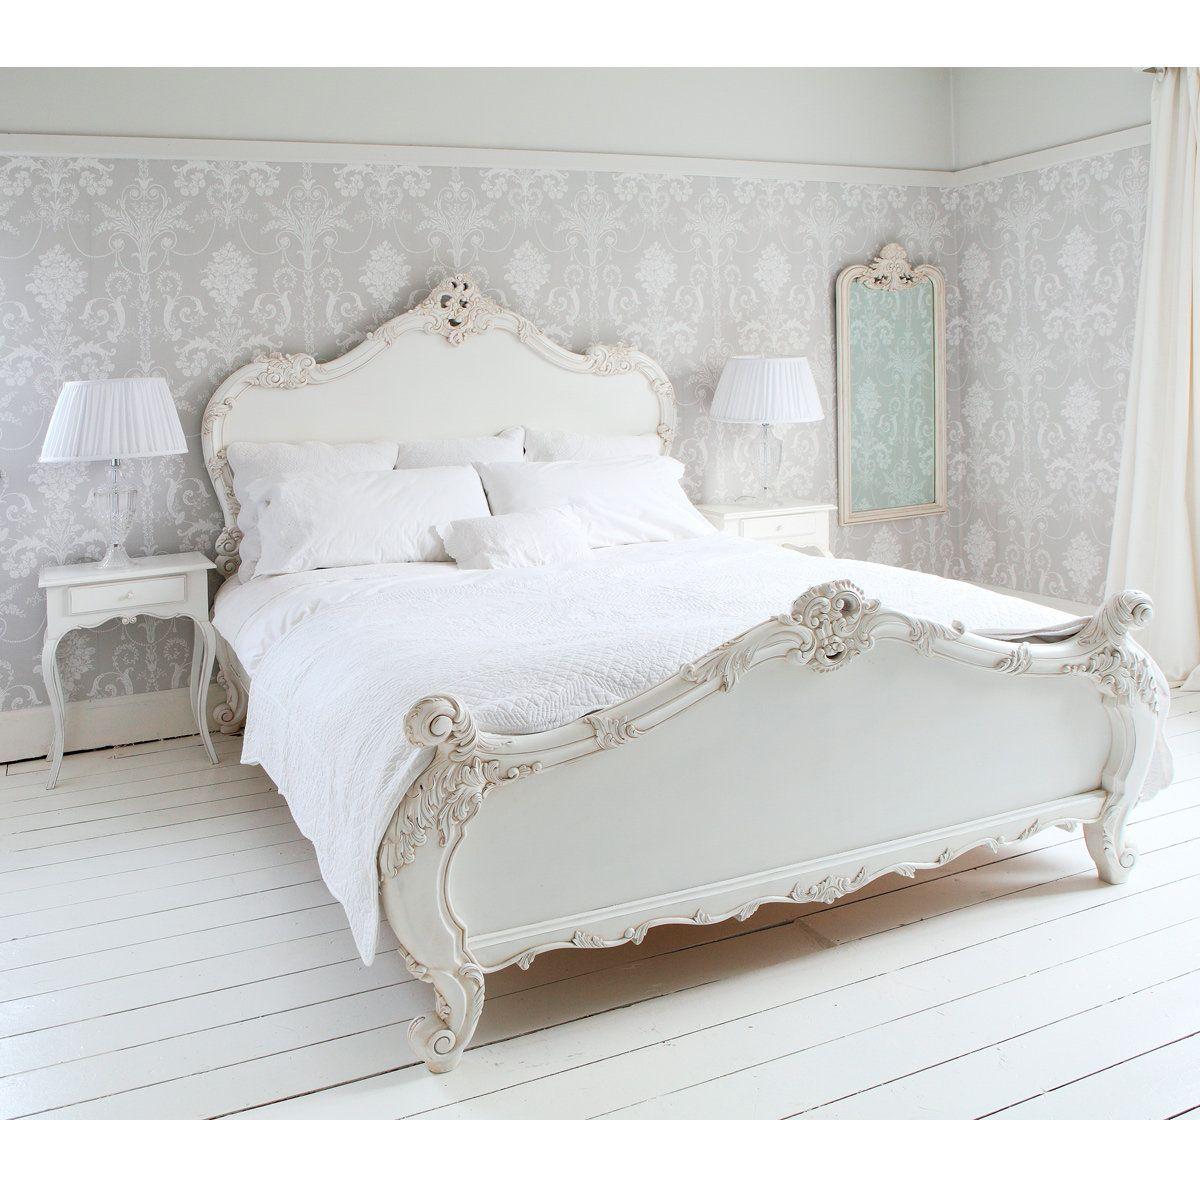 Provencal sassy white french bed french decor pinterest french